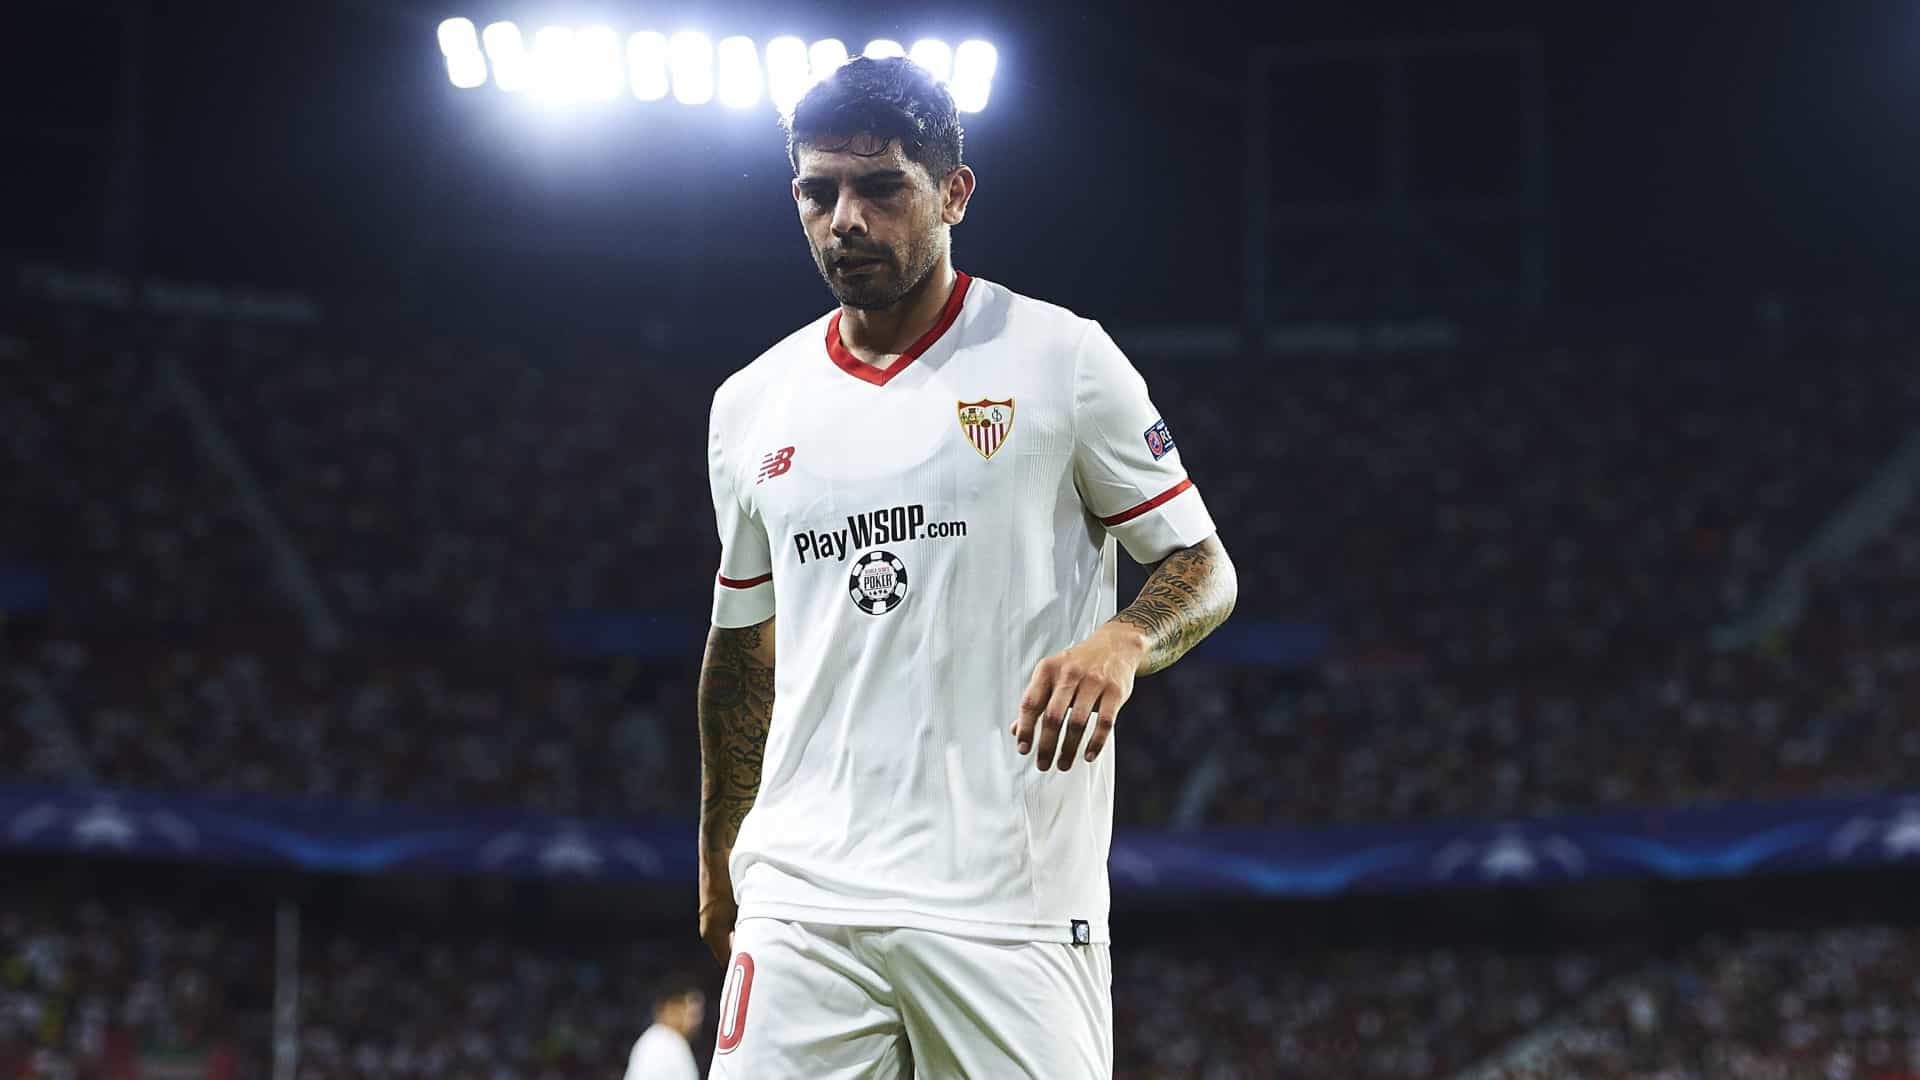 Sevilla bate o Atlético de Madri e está na semi